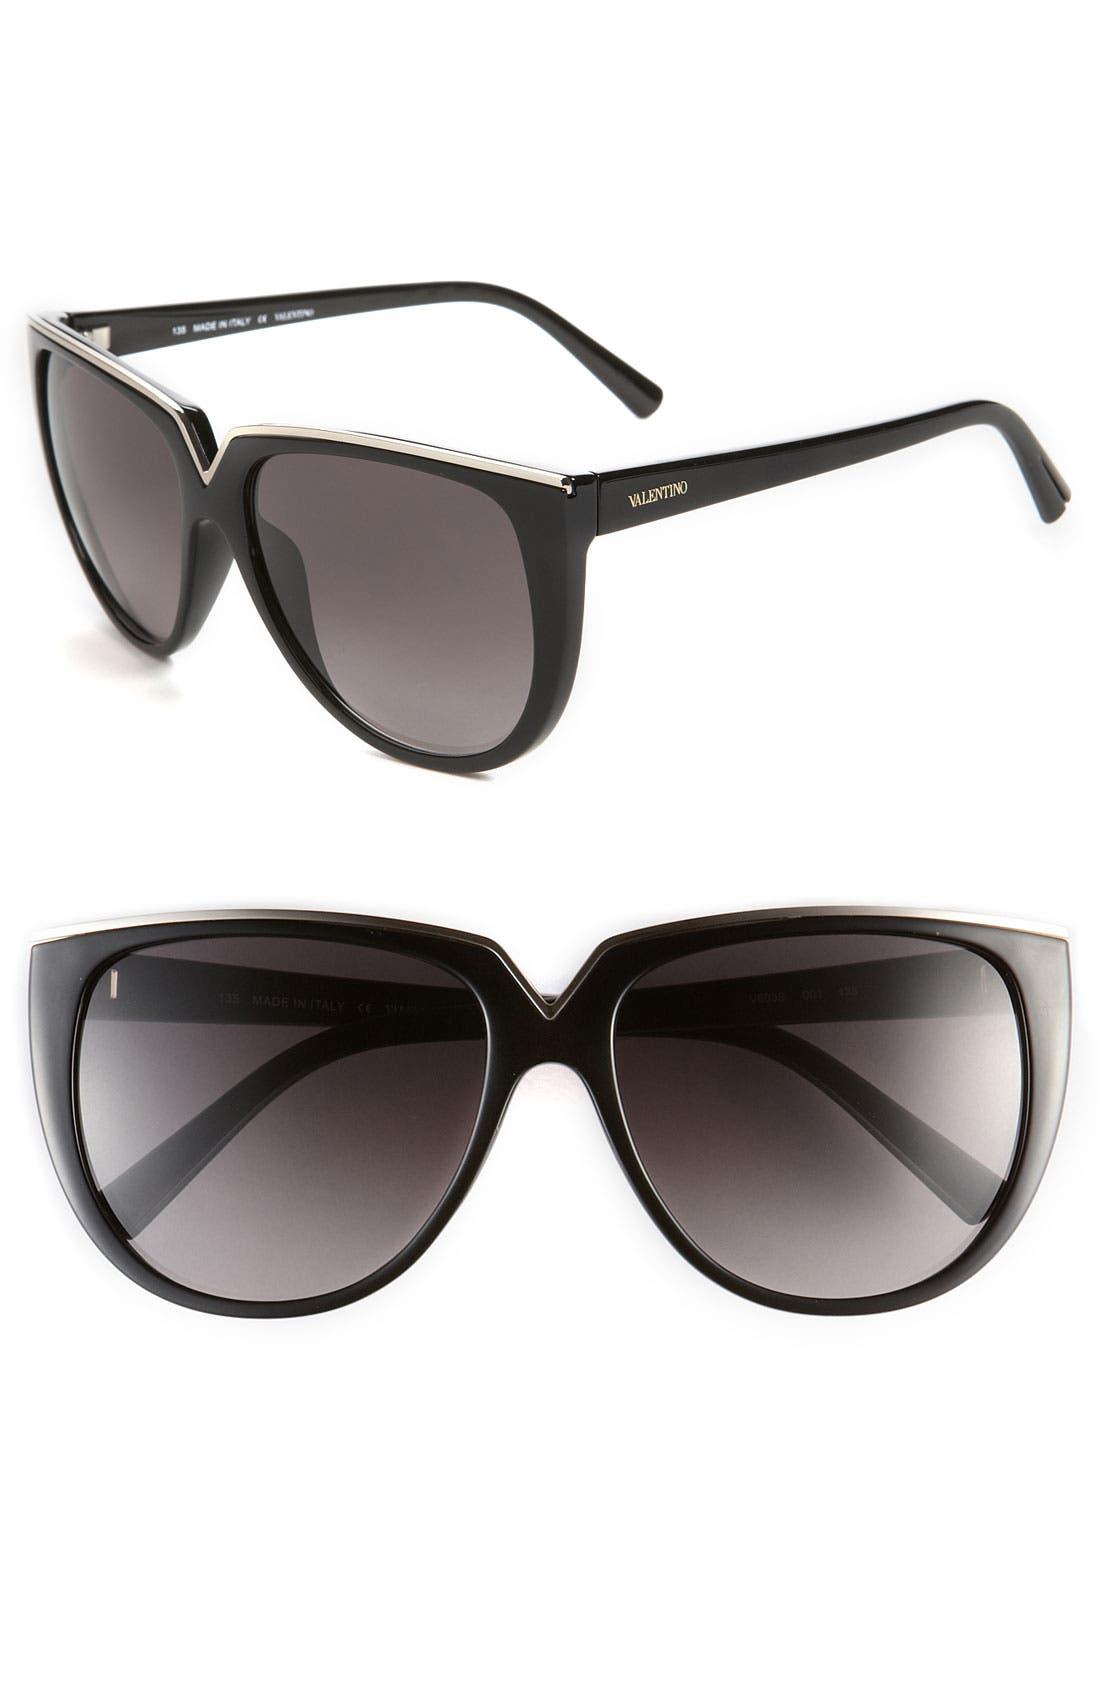 Main Image - Valentino 57mm Retro Sunglasses